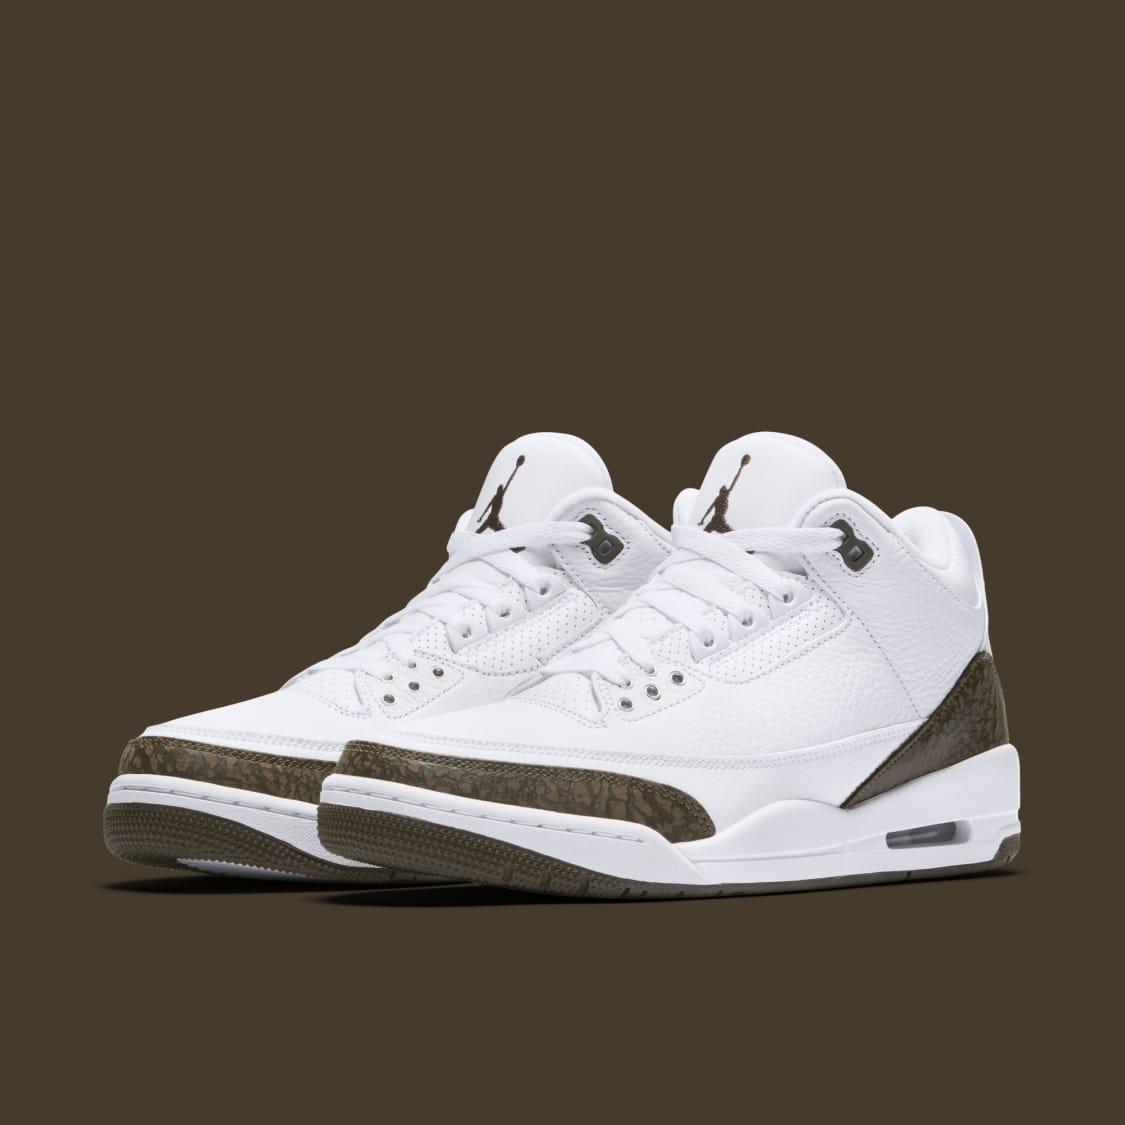 aaa47fe4f85a7e Air Jordan 3  Mocha  Release Date December 2018 136064-122